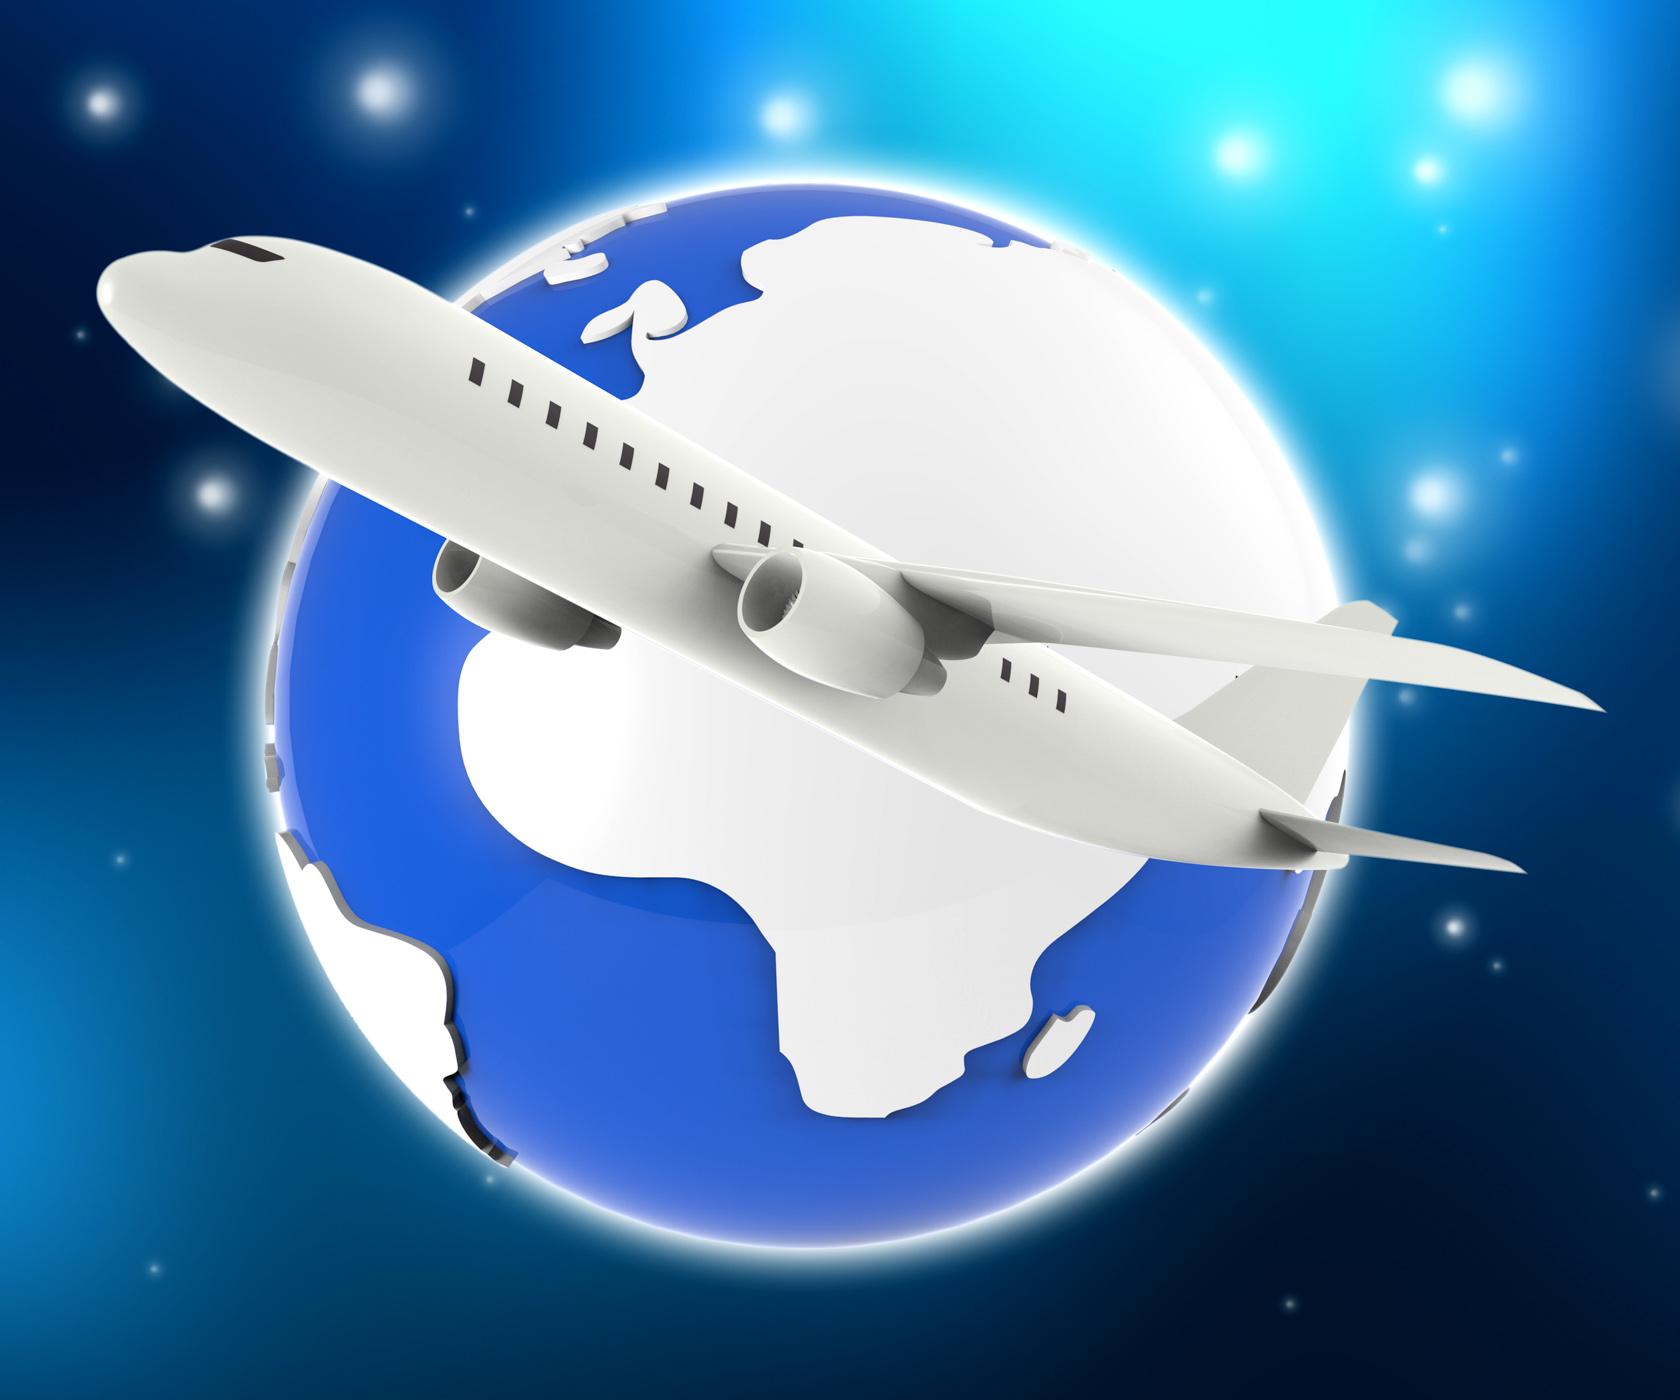 World Plane Represents Travel Guide And Air, Aeroplane, Travel, Planet, Roam, HQ Photo